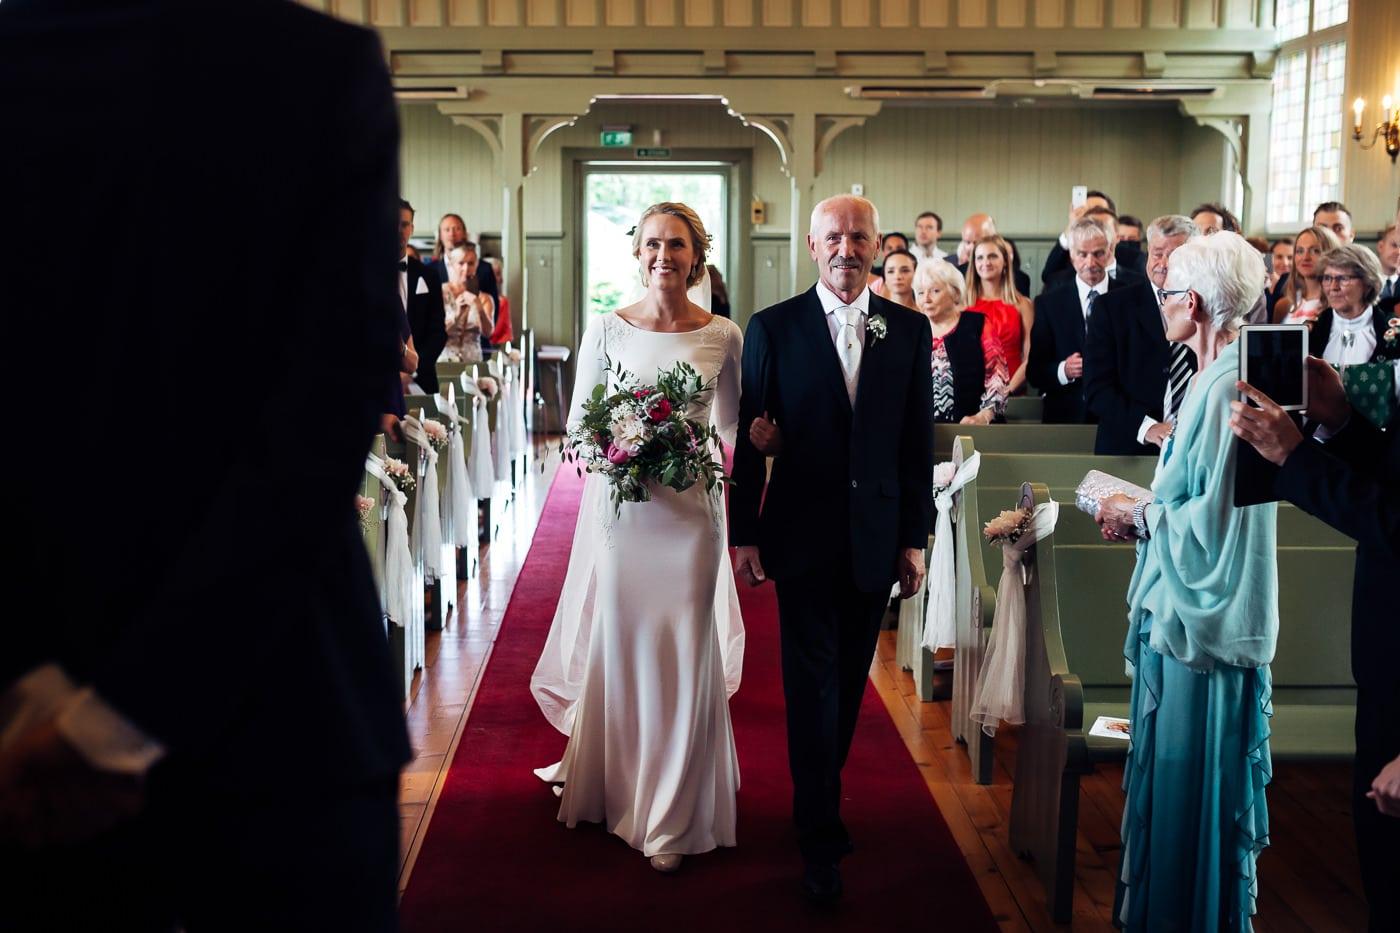 Karoline & Andreas - bryllup i Østfold med magiske detaljer Bryllup Fredrikstad Fotograf 21